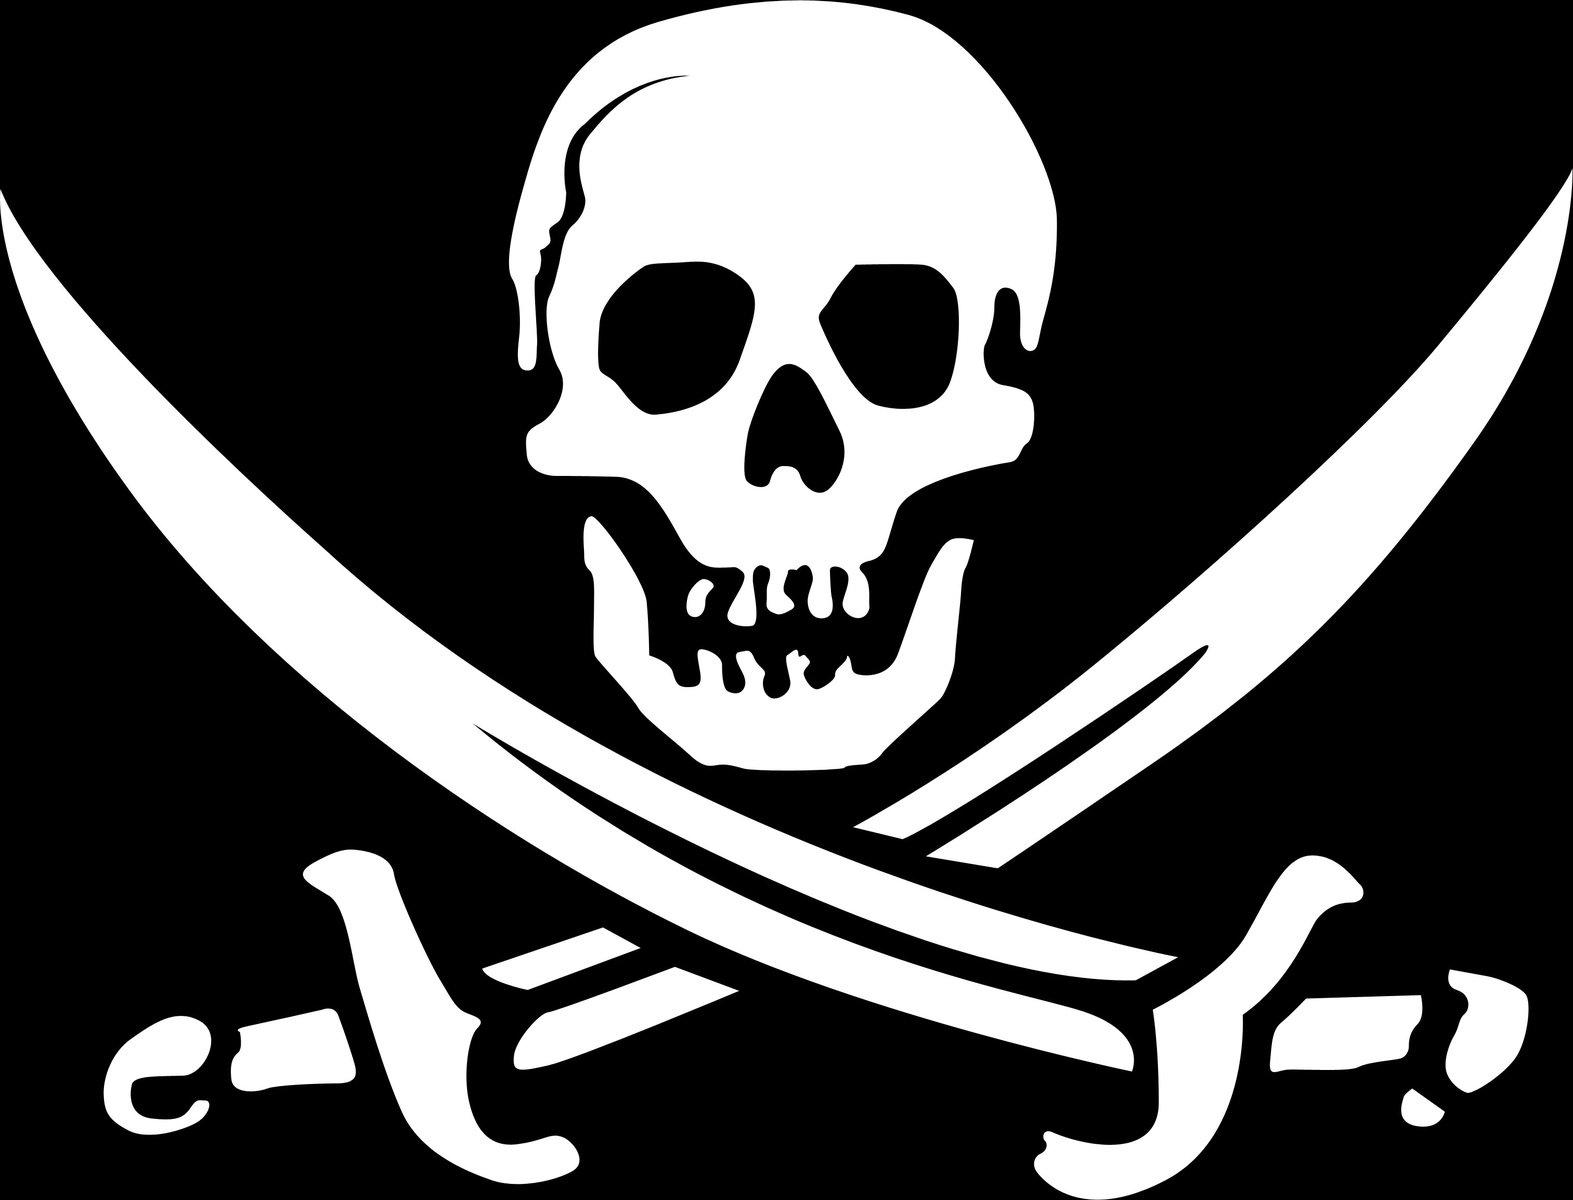 Immagini Di Teschio Pirati free logo del teschio pirata stock photo - freeimages